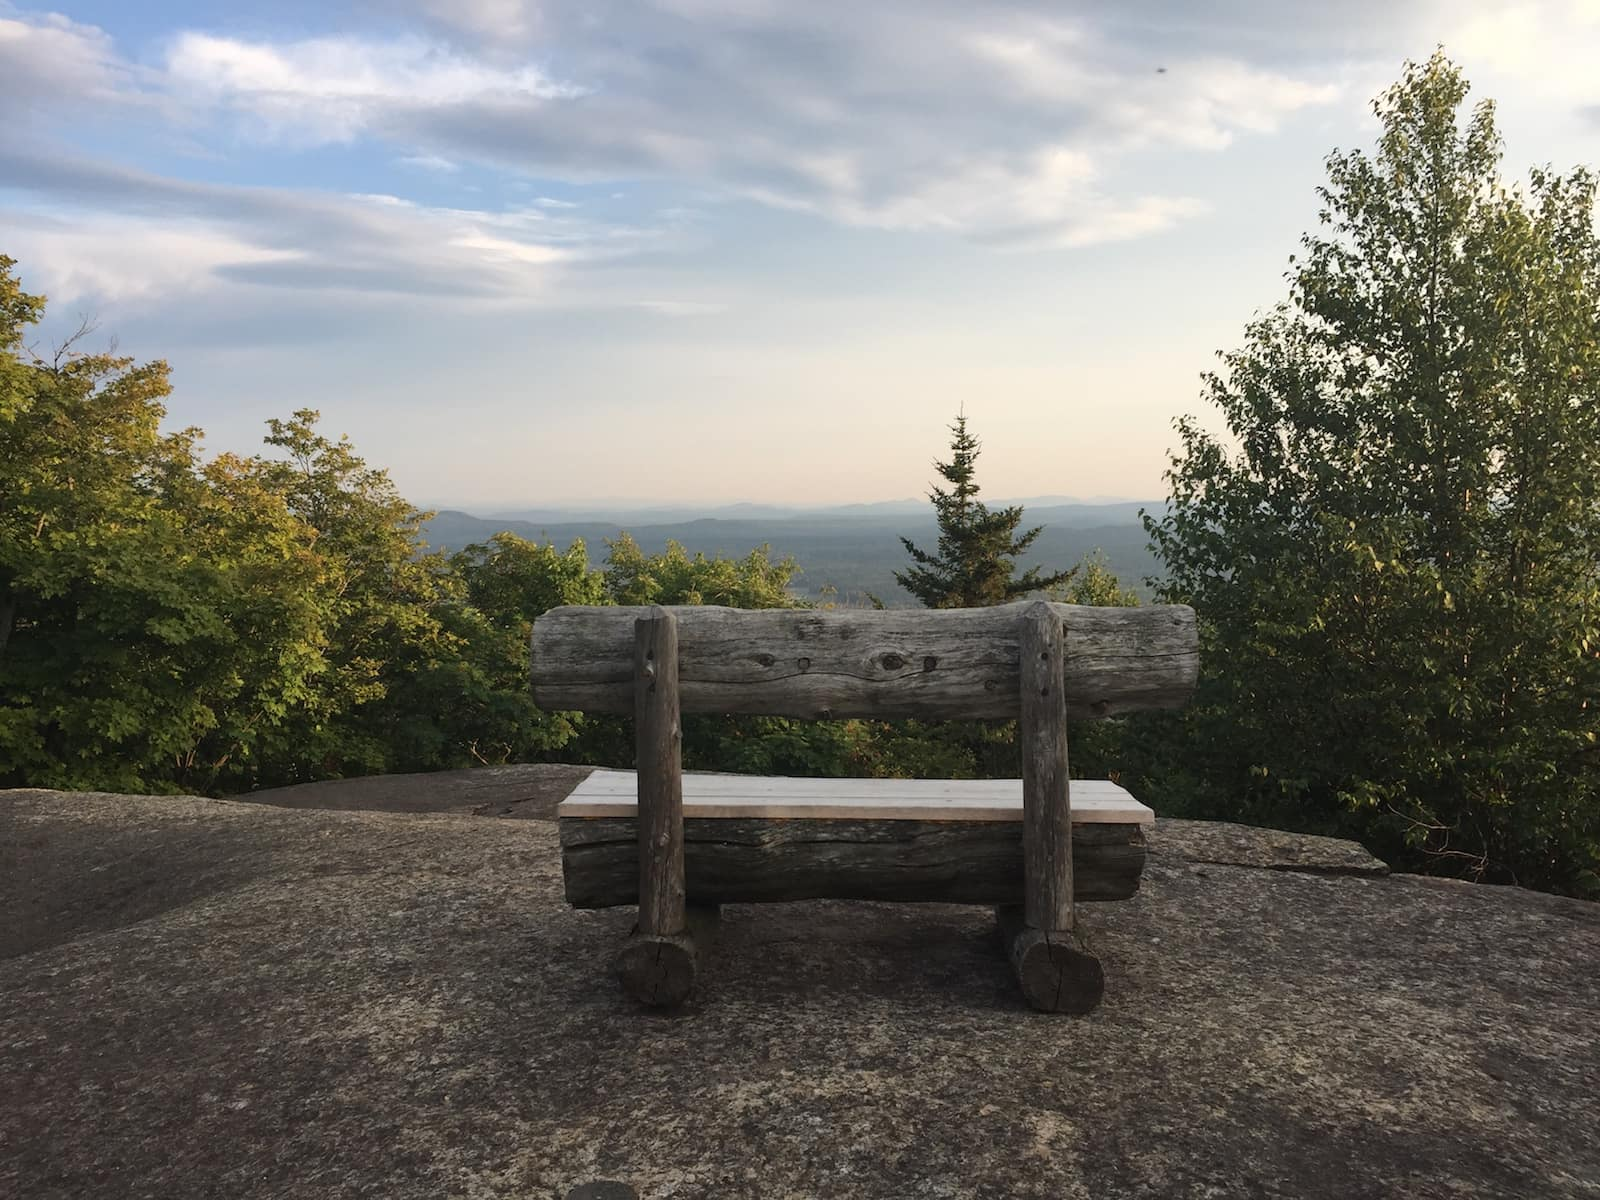 mt-arab-st-lawrence-county-hiking-trail